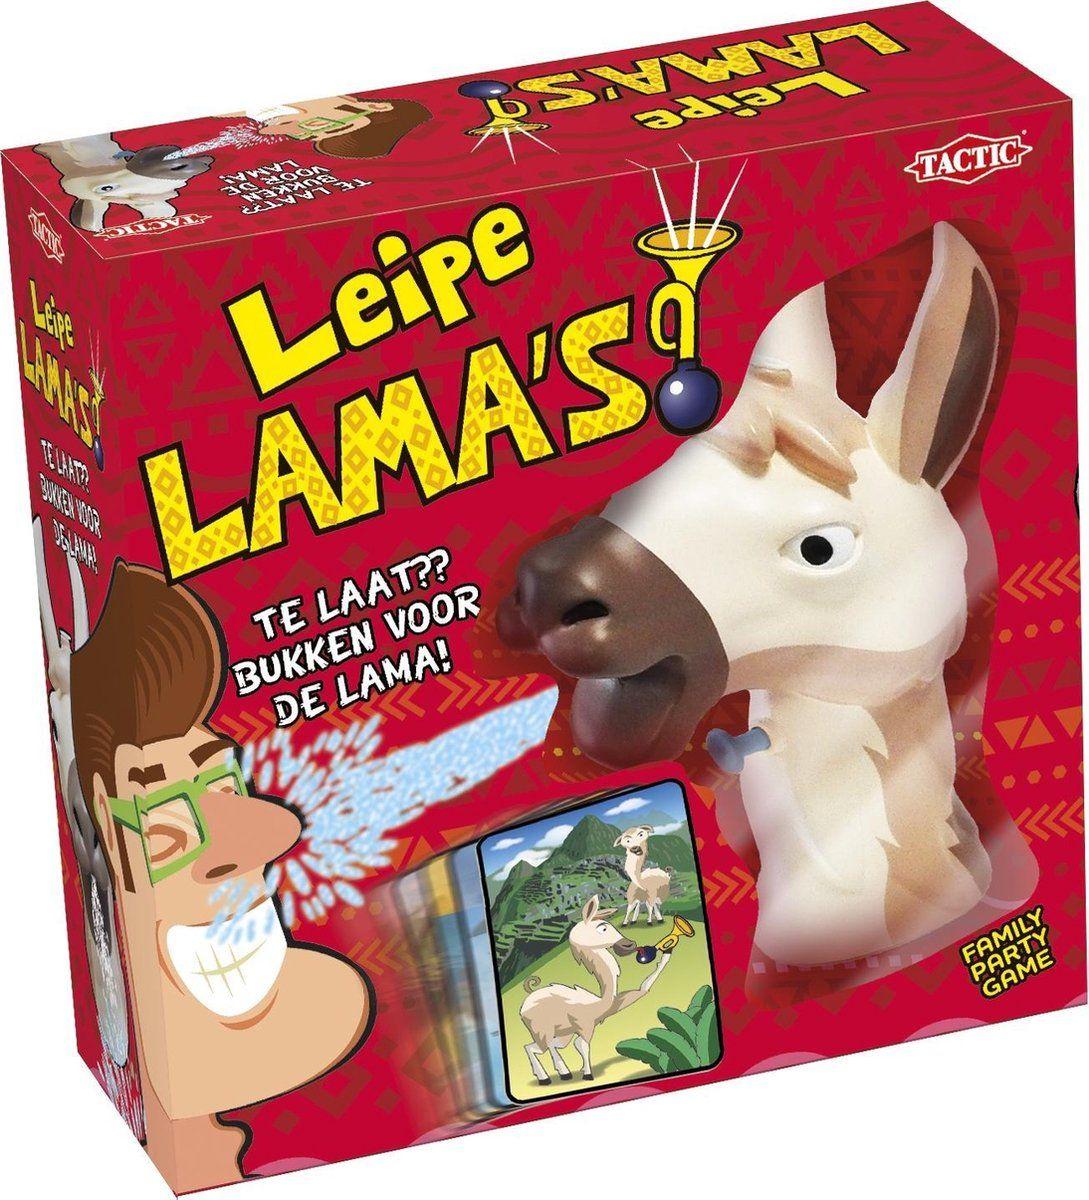 Tactic familiespel: Leipe Lama's! @ Dagknaller